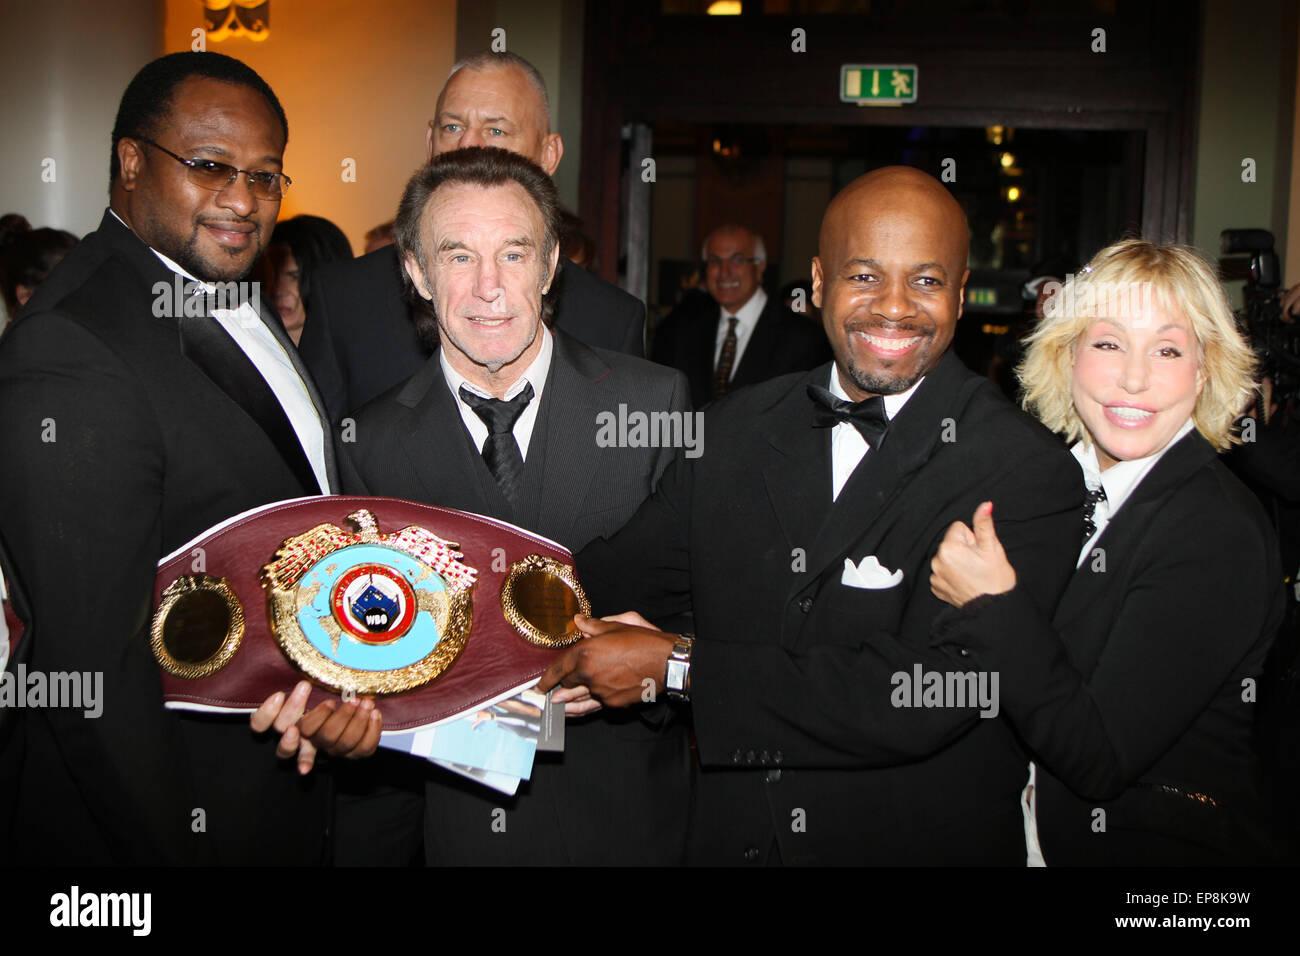 Sportpresseball - Français Sports Media Ball 2014 tenue à l'Alte Oper comprend: Lamon BREWSTER,Rene Photo Stock